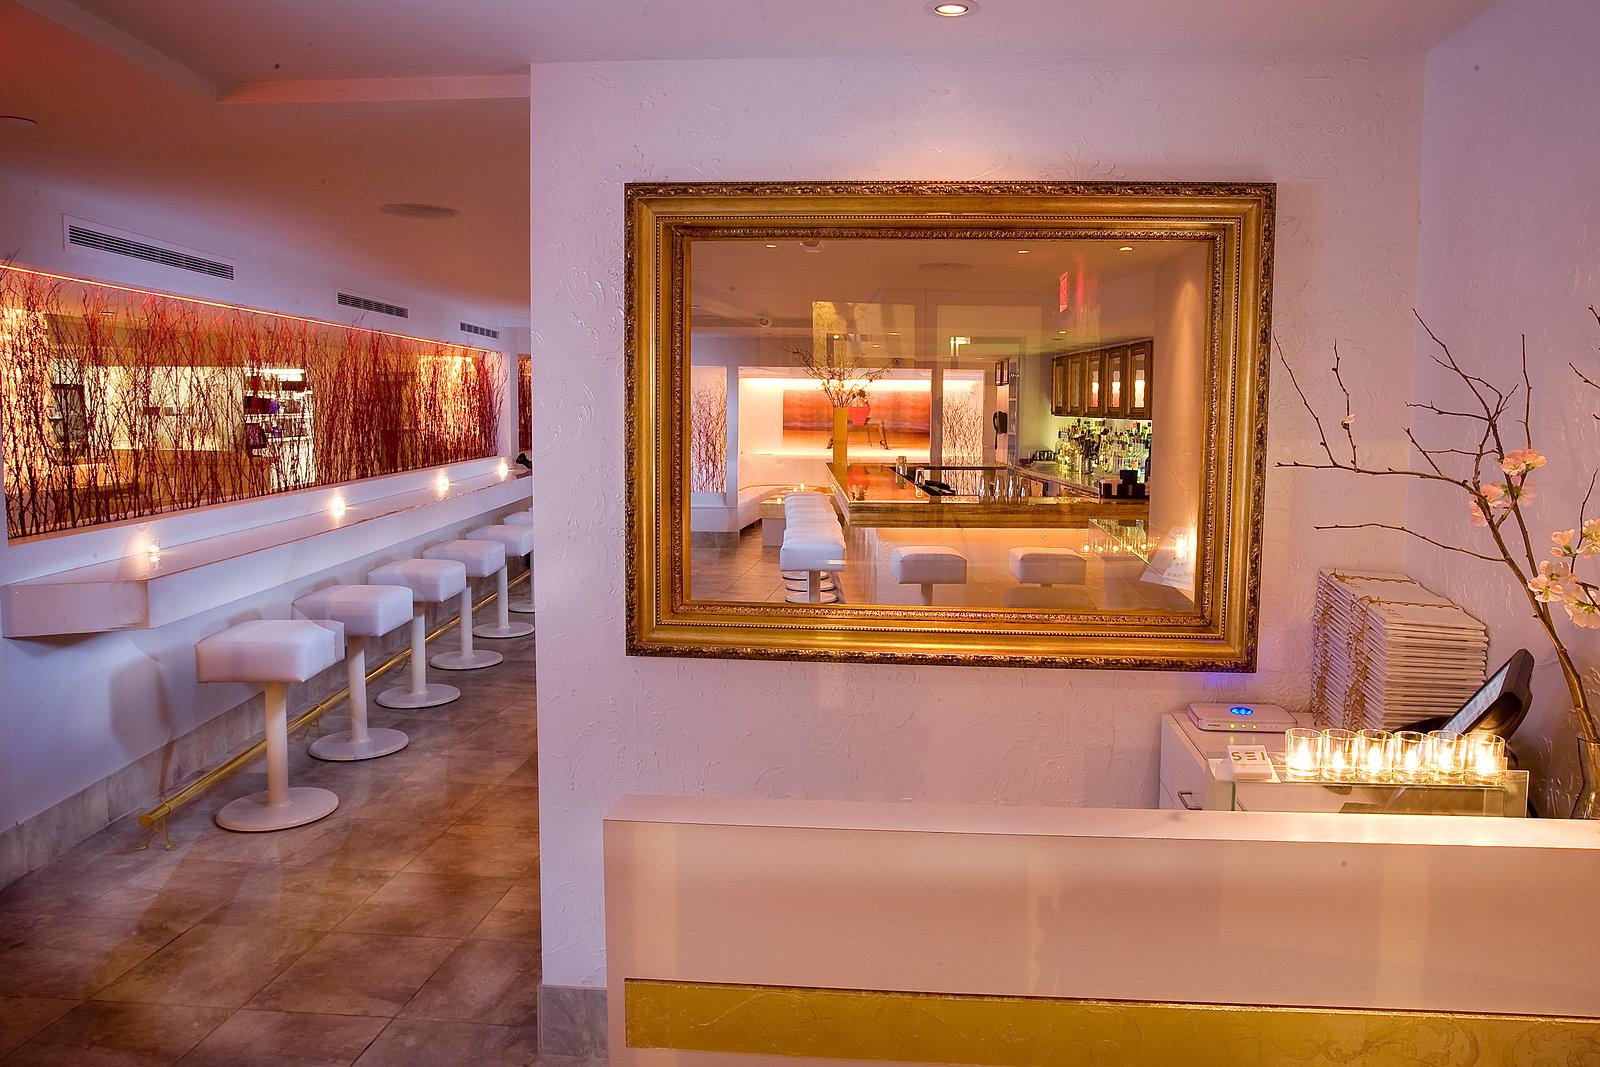 Best Rated Restaurants In Washington Dc